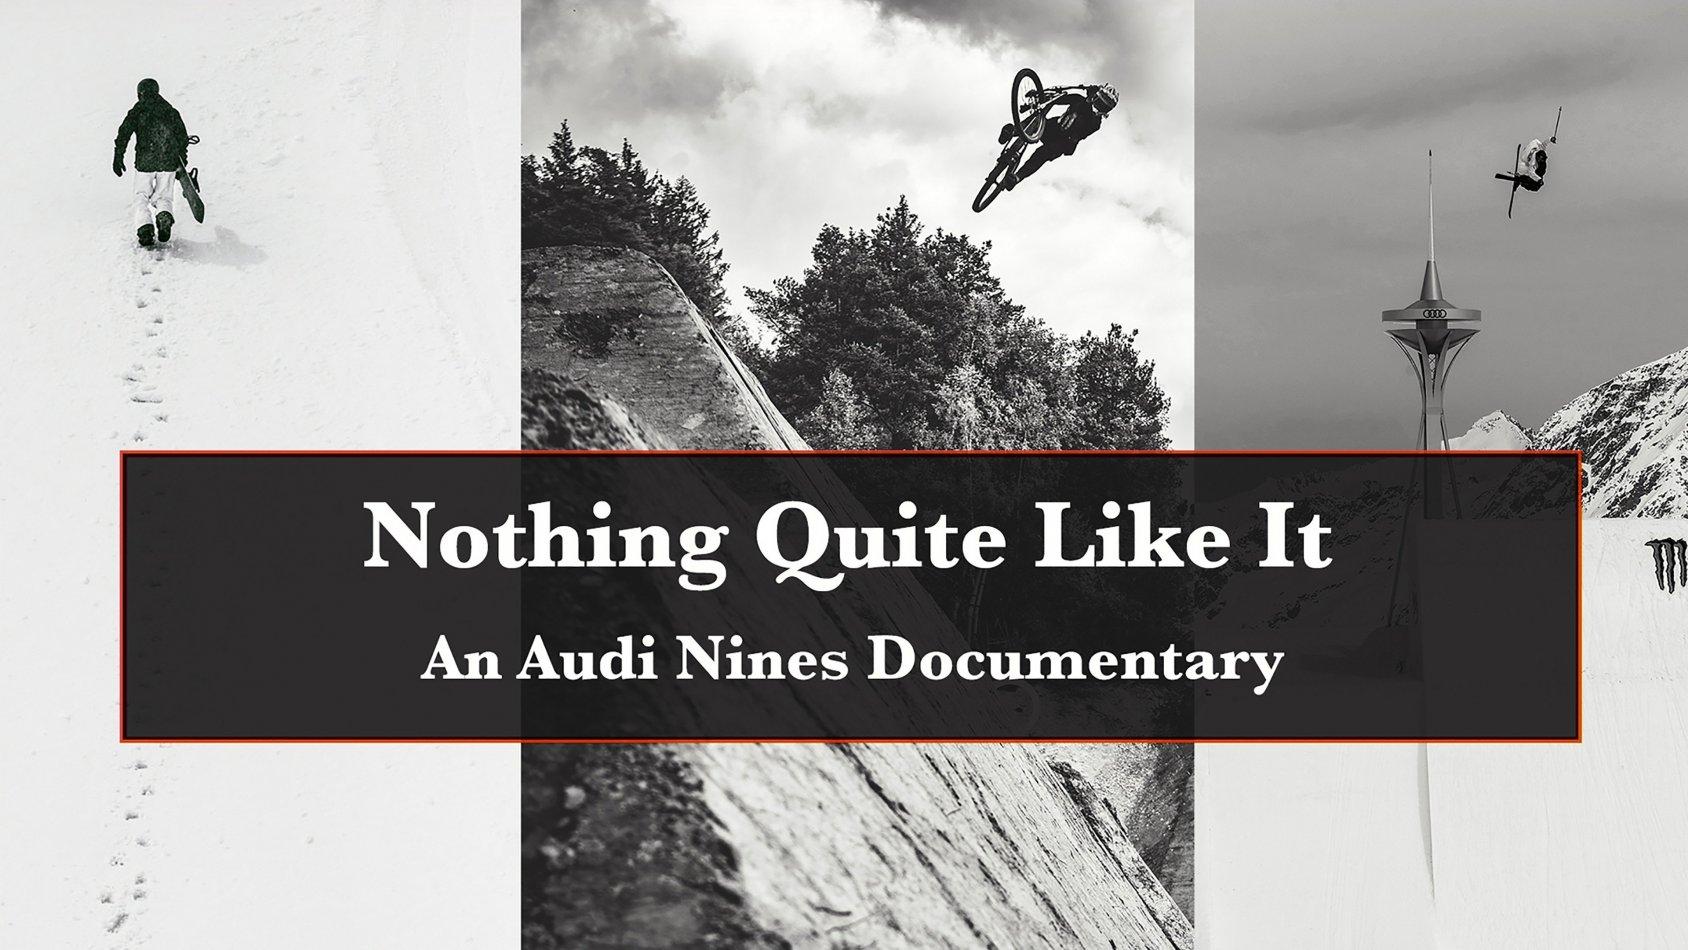 Audi Nines: Nothing Quite Like It